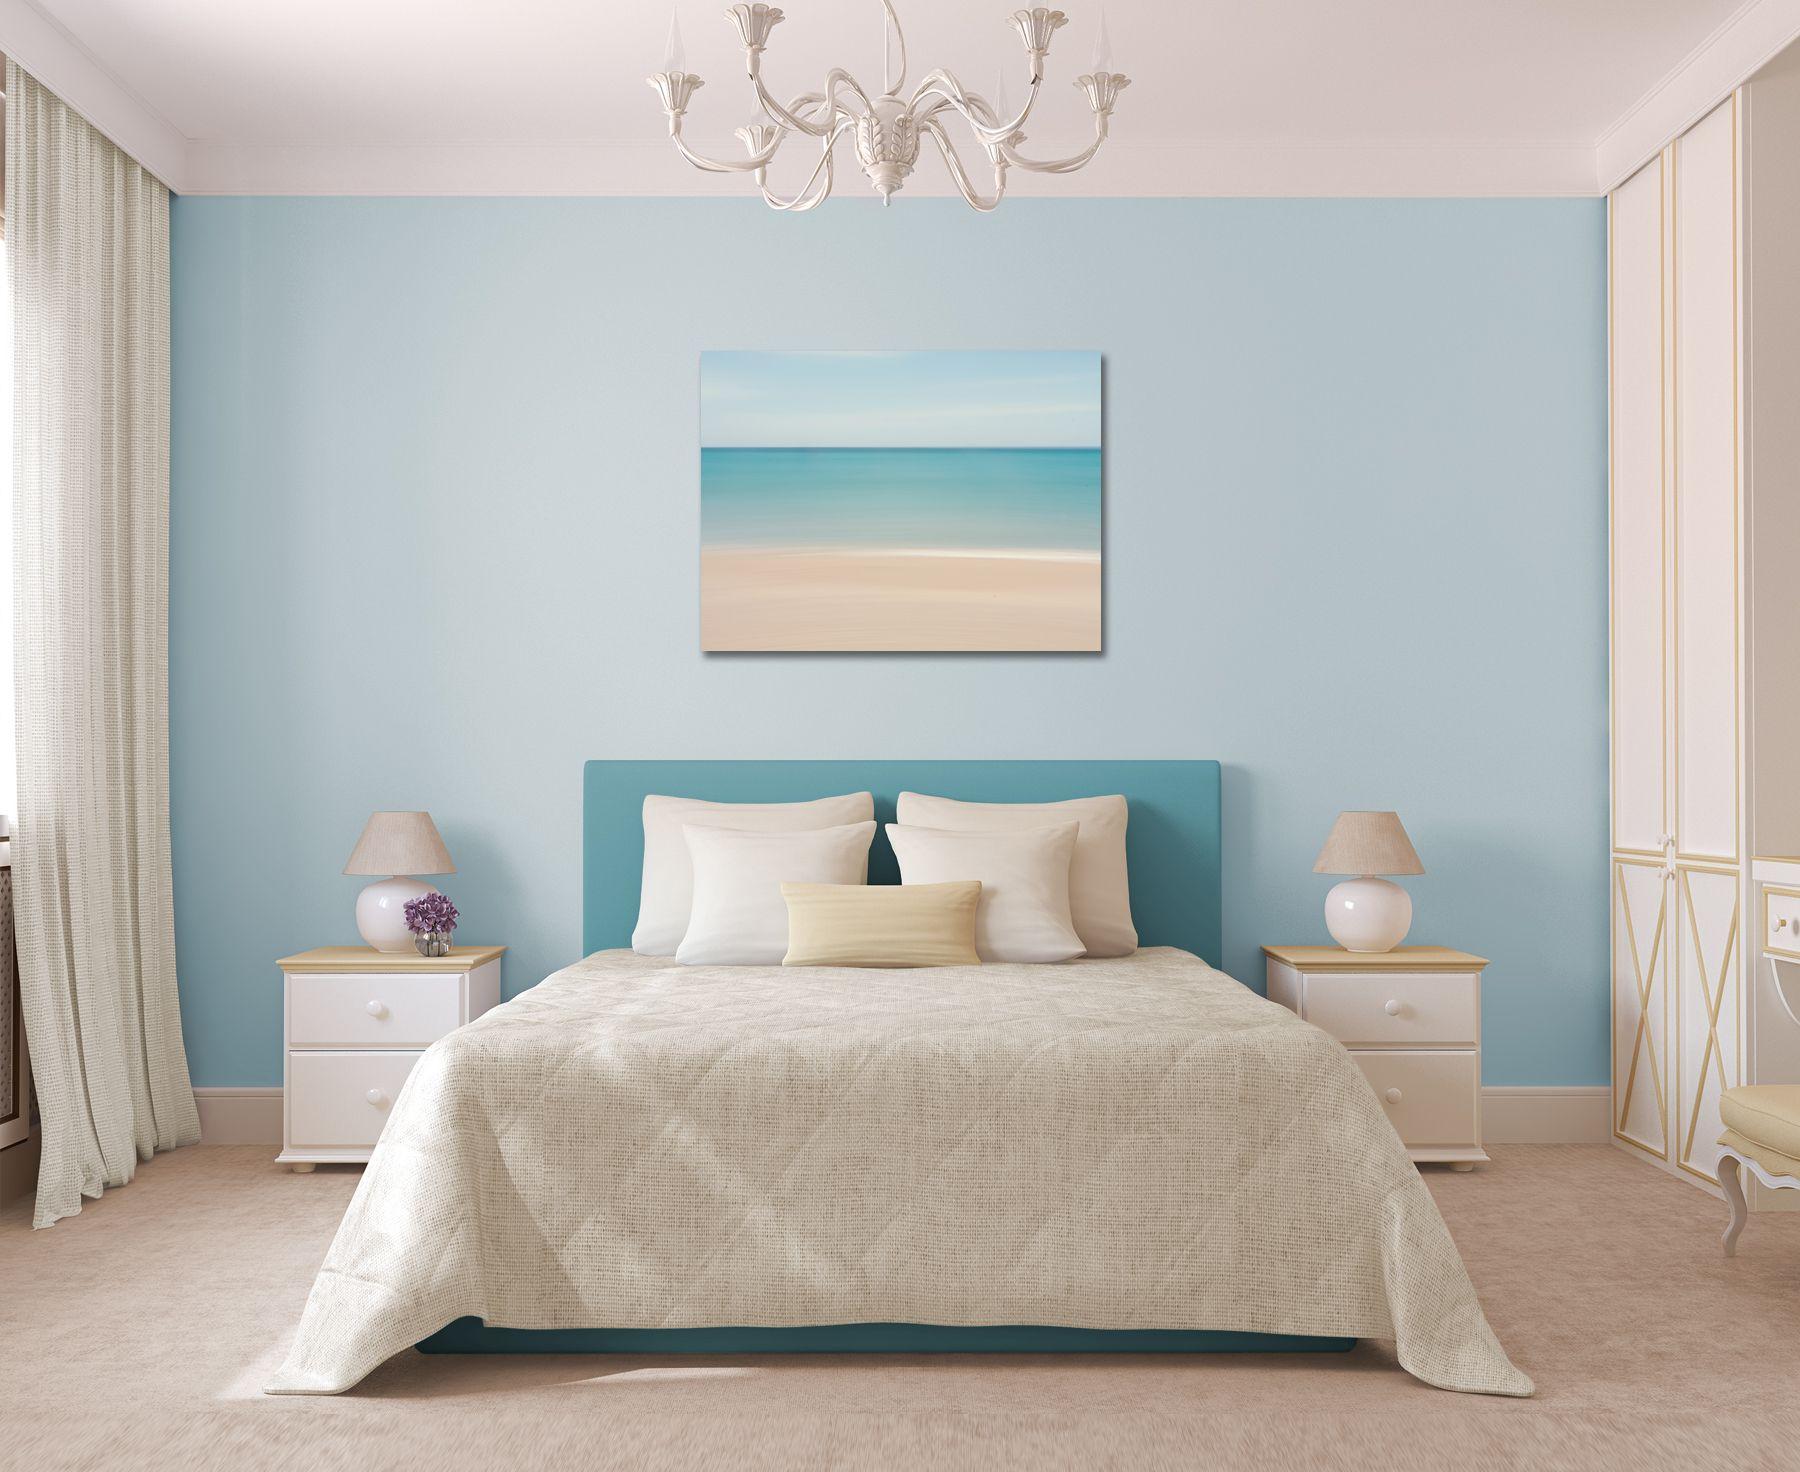 Beach Decor Canvas Gallery Wrap Abstract Ocean Photo Large Etsy Wall Decor Bedroom Beach Wall Art Decor Bedroom Decor